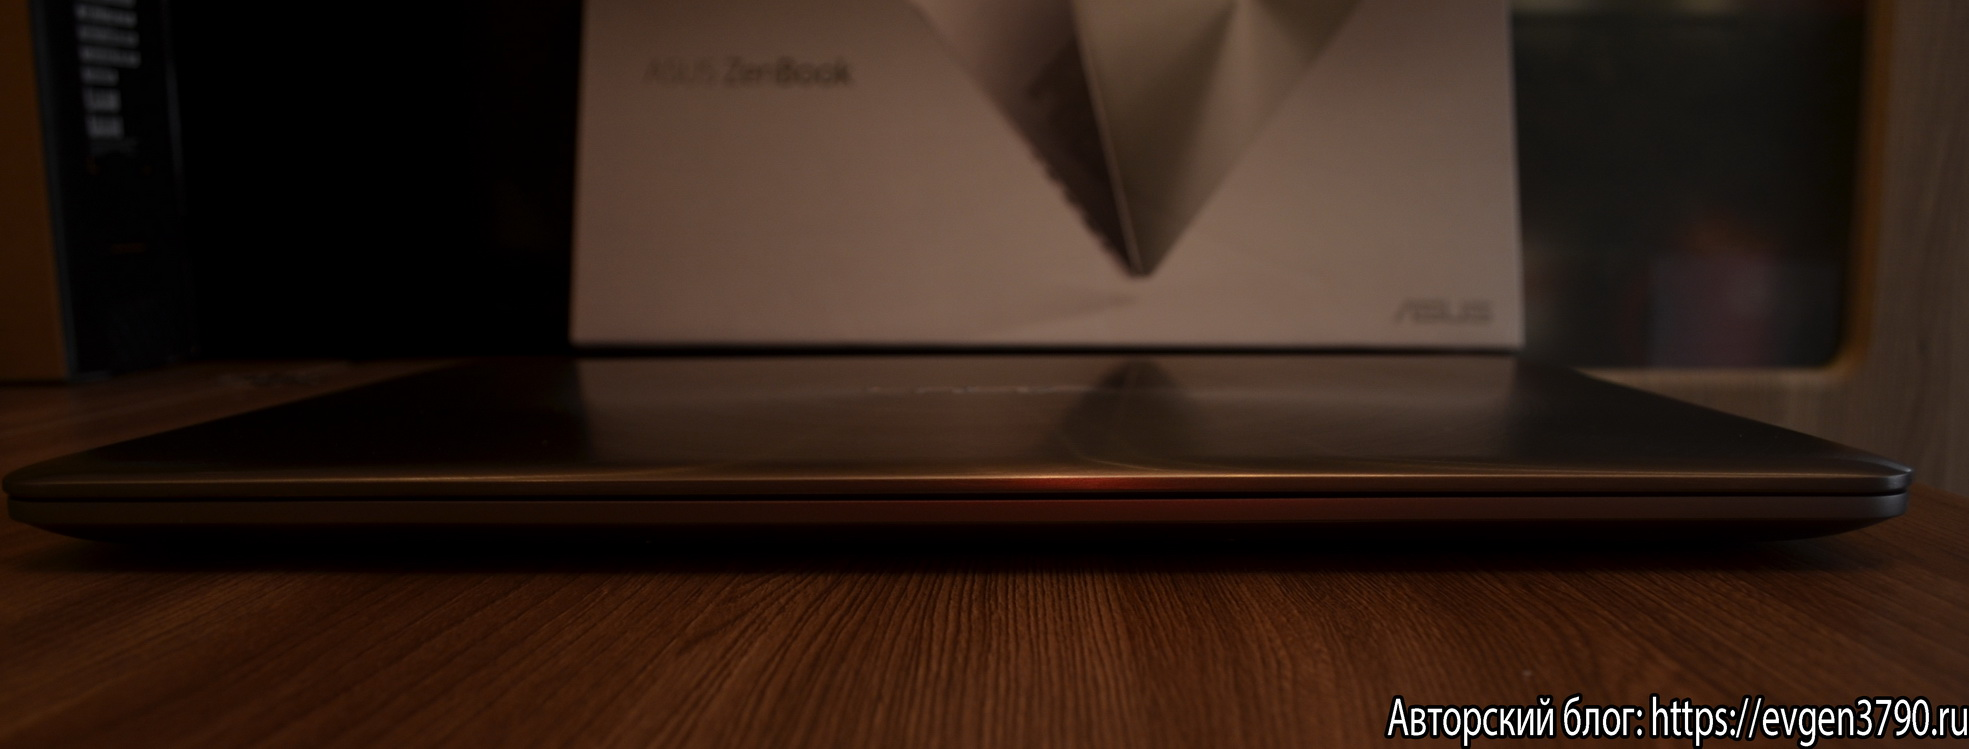 Ноутбук 2 ASUS Zenbook UX510UW-CN048T